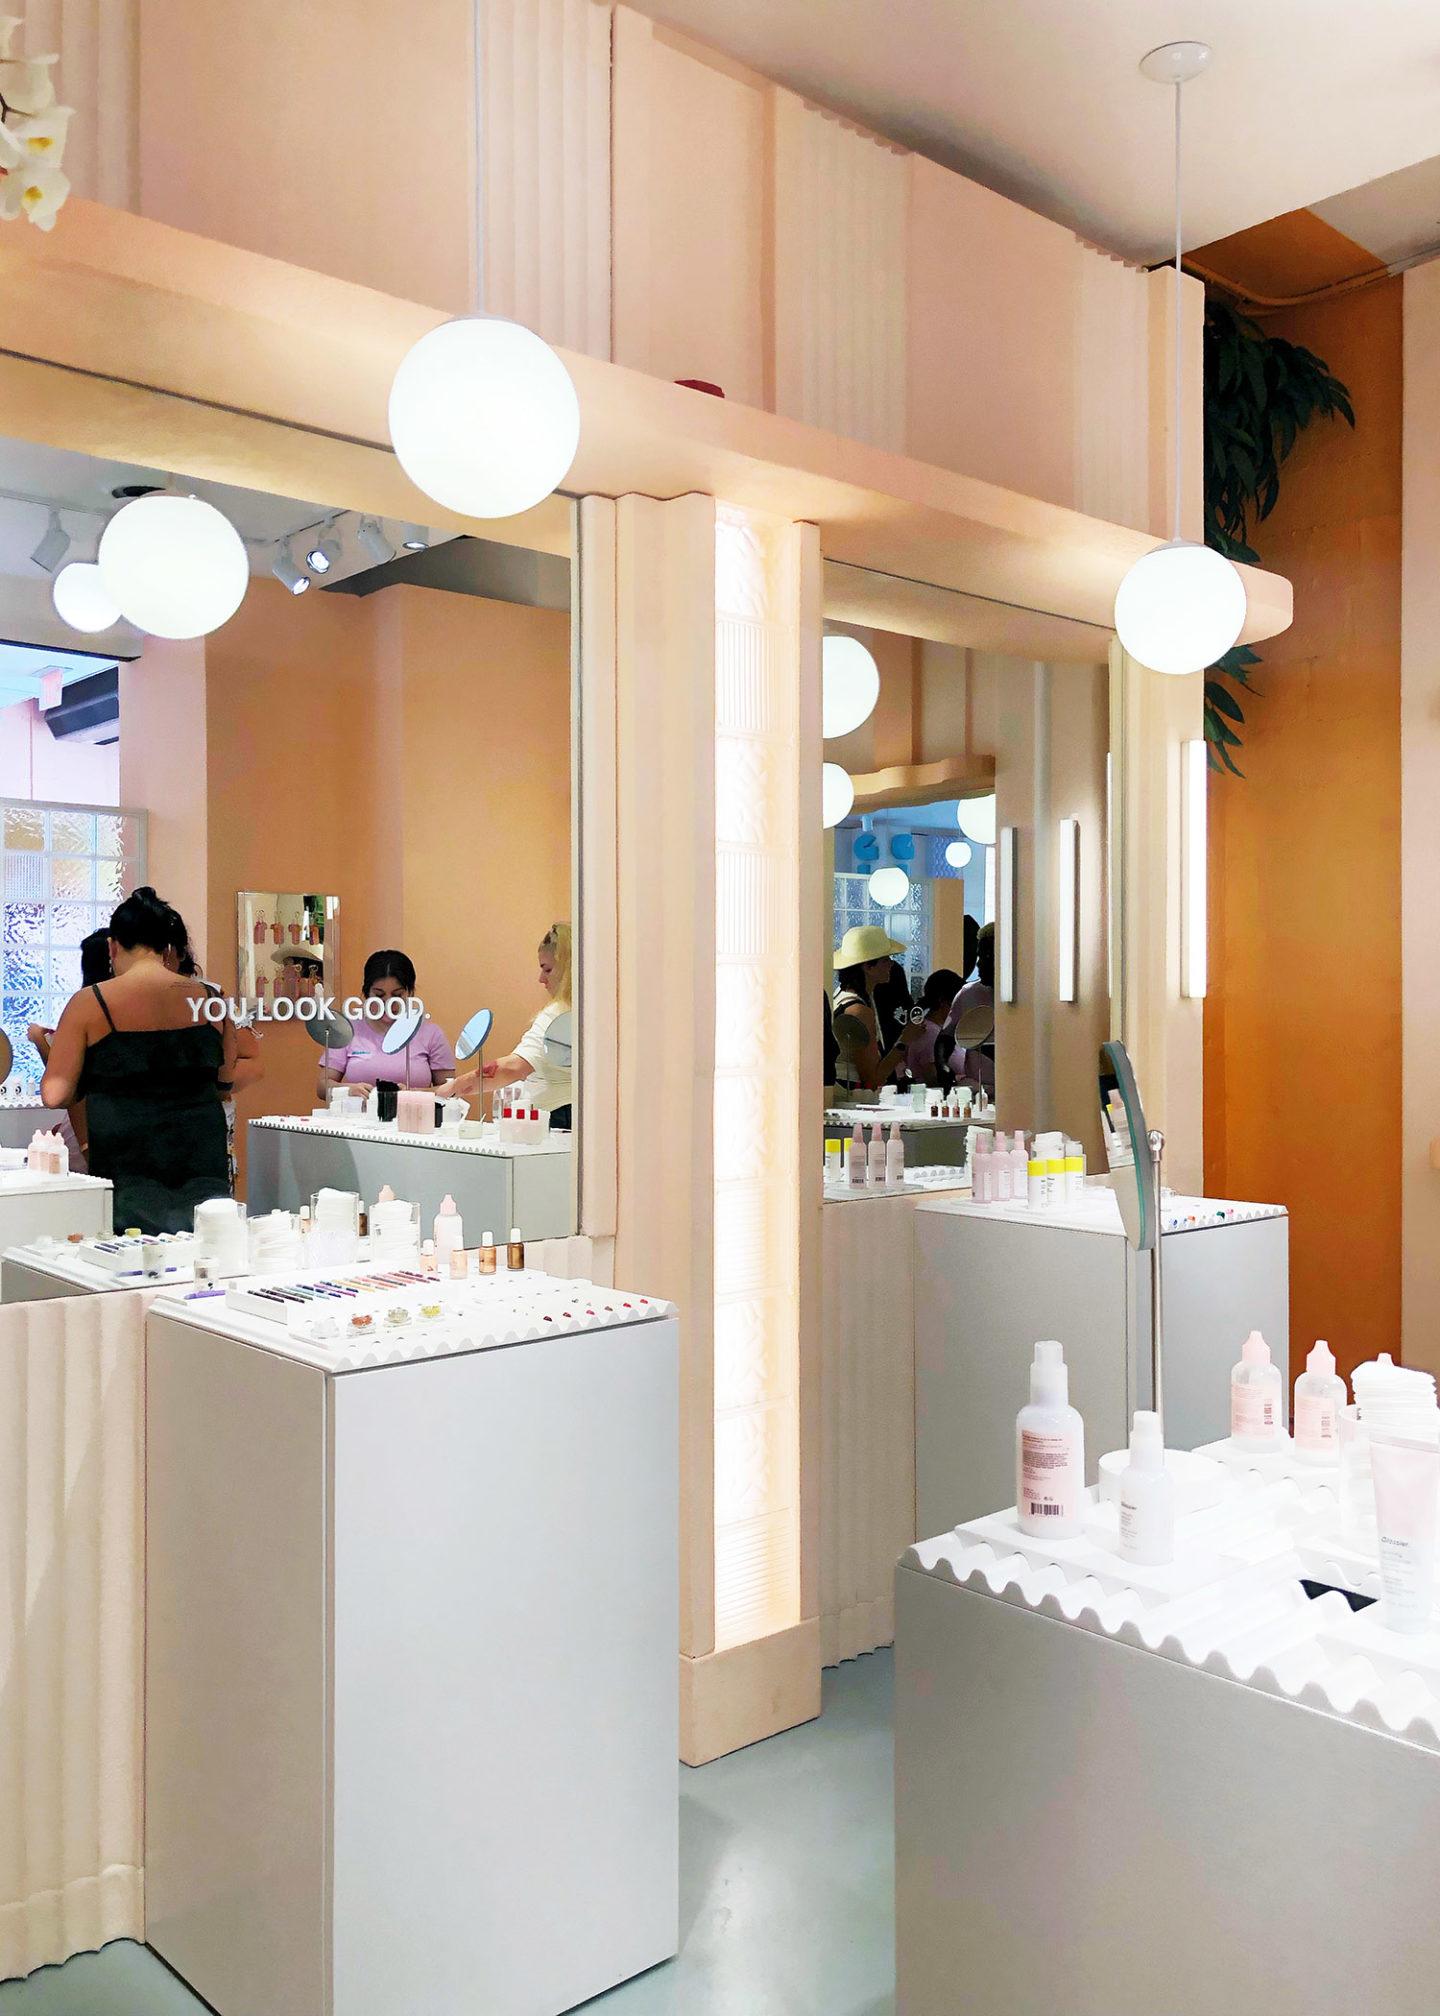 Glossier Miami via The Beauty Look Book